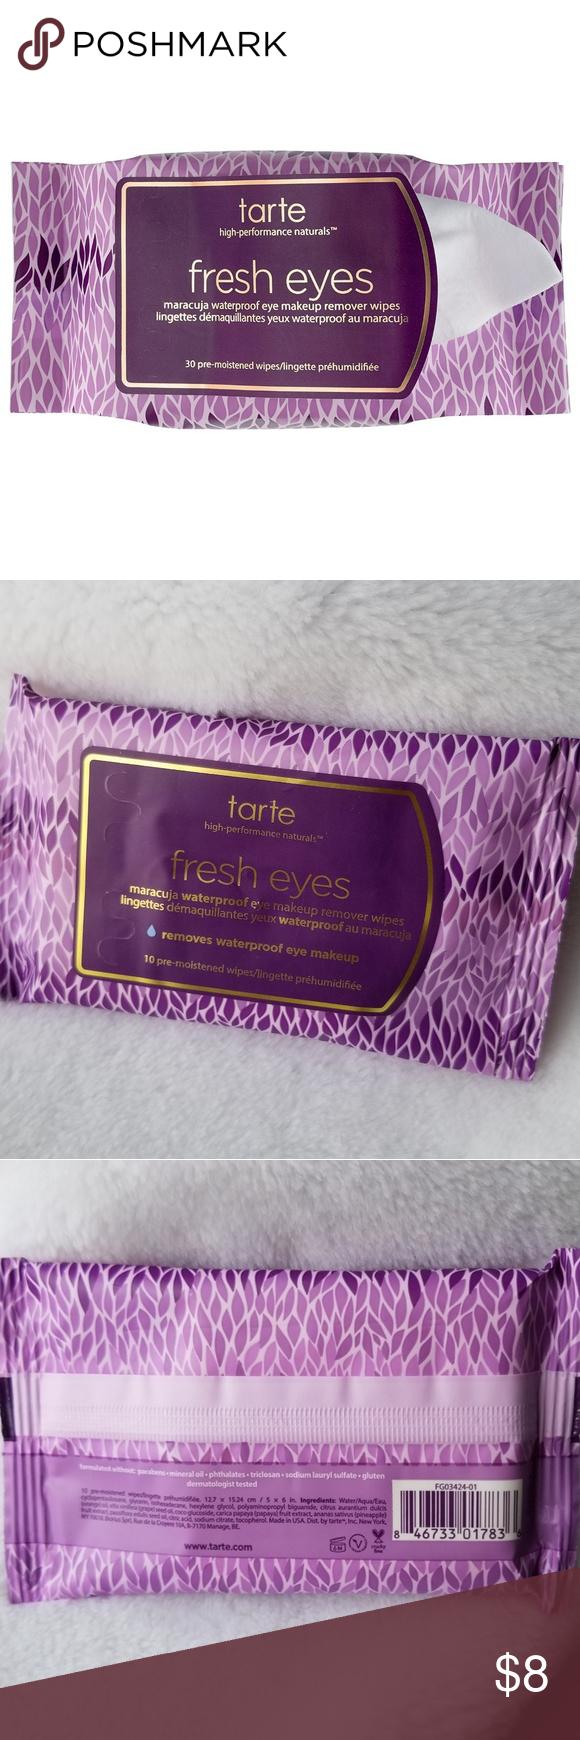 Nwt tarte fresh eyes maracuja makeup remover wipes nwt